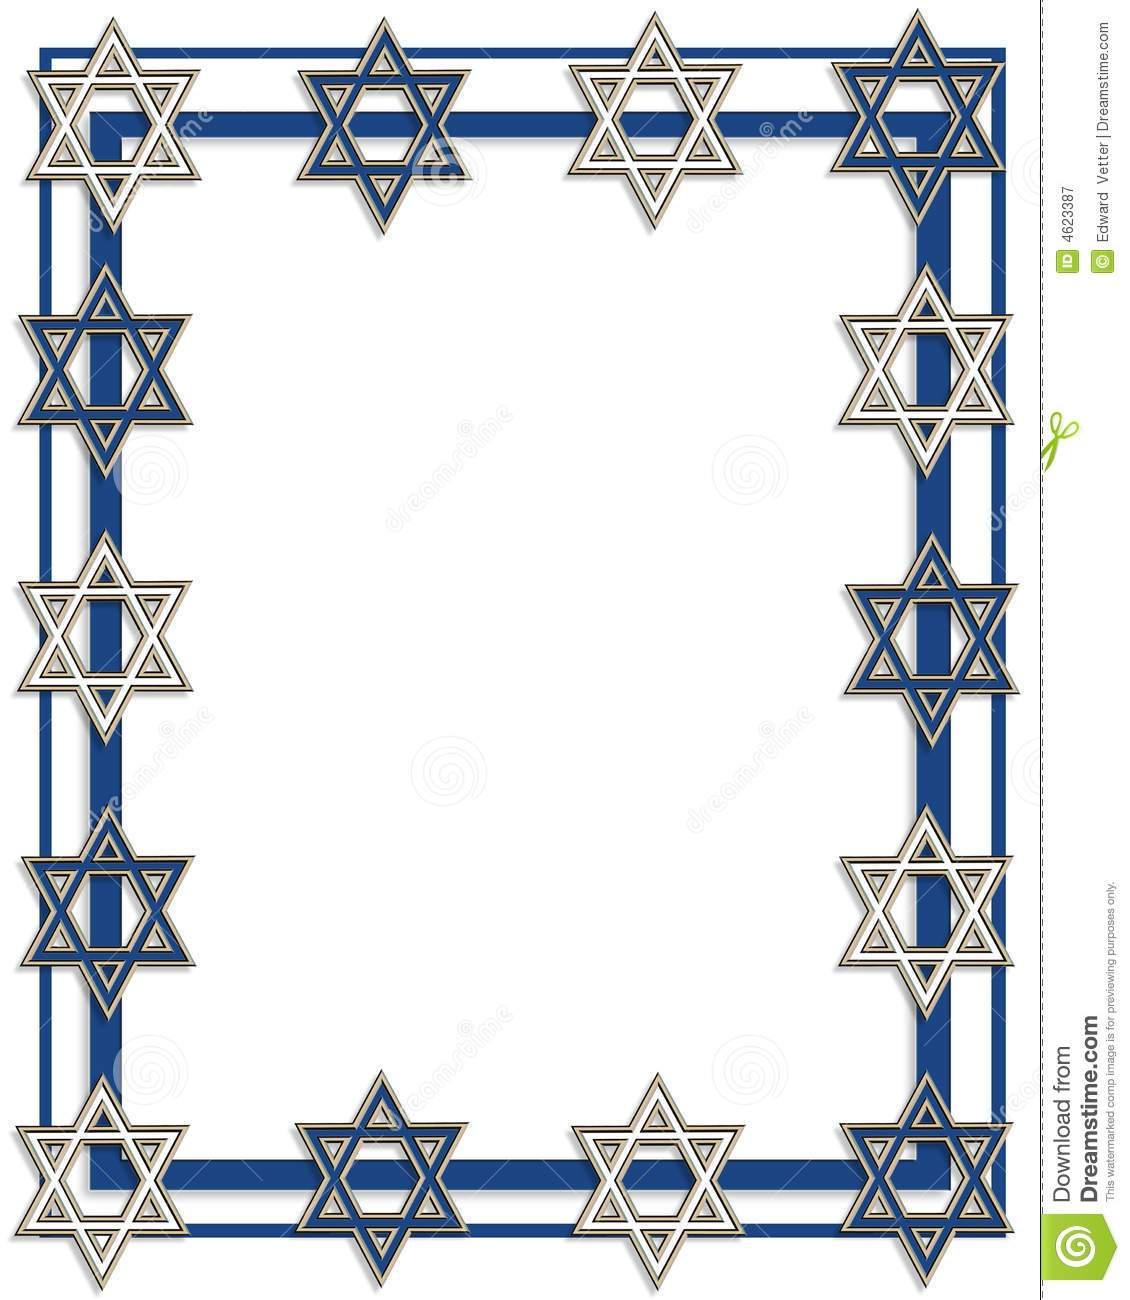 Passover border clipart 2 » Clipart Portal.